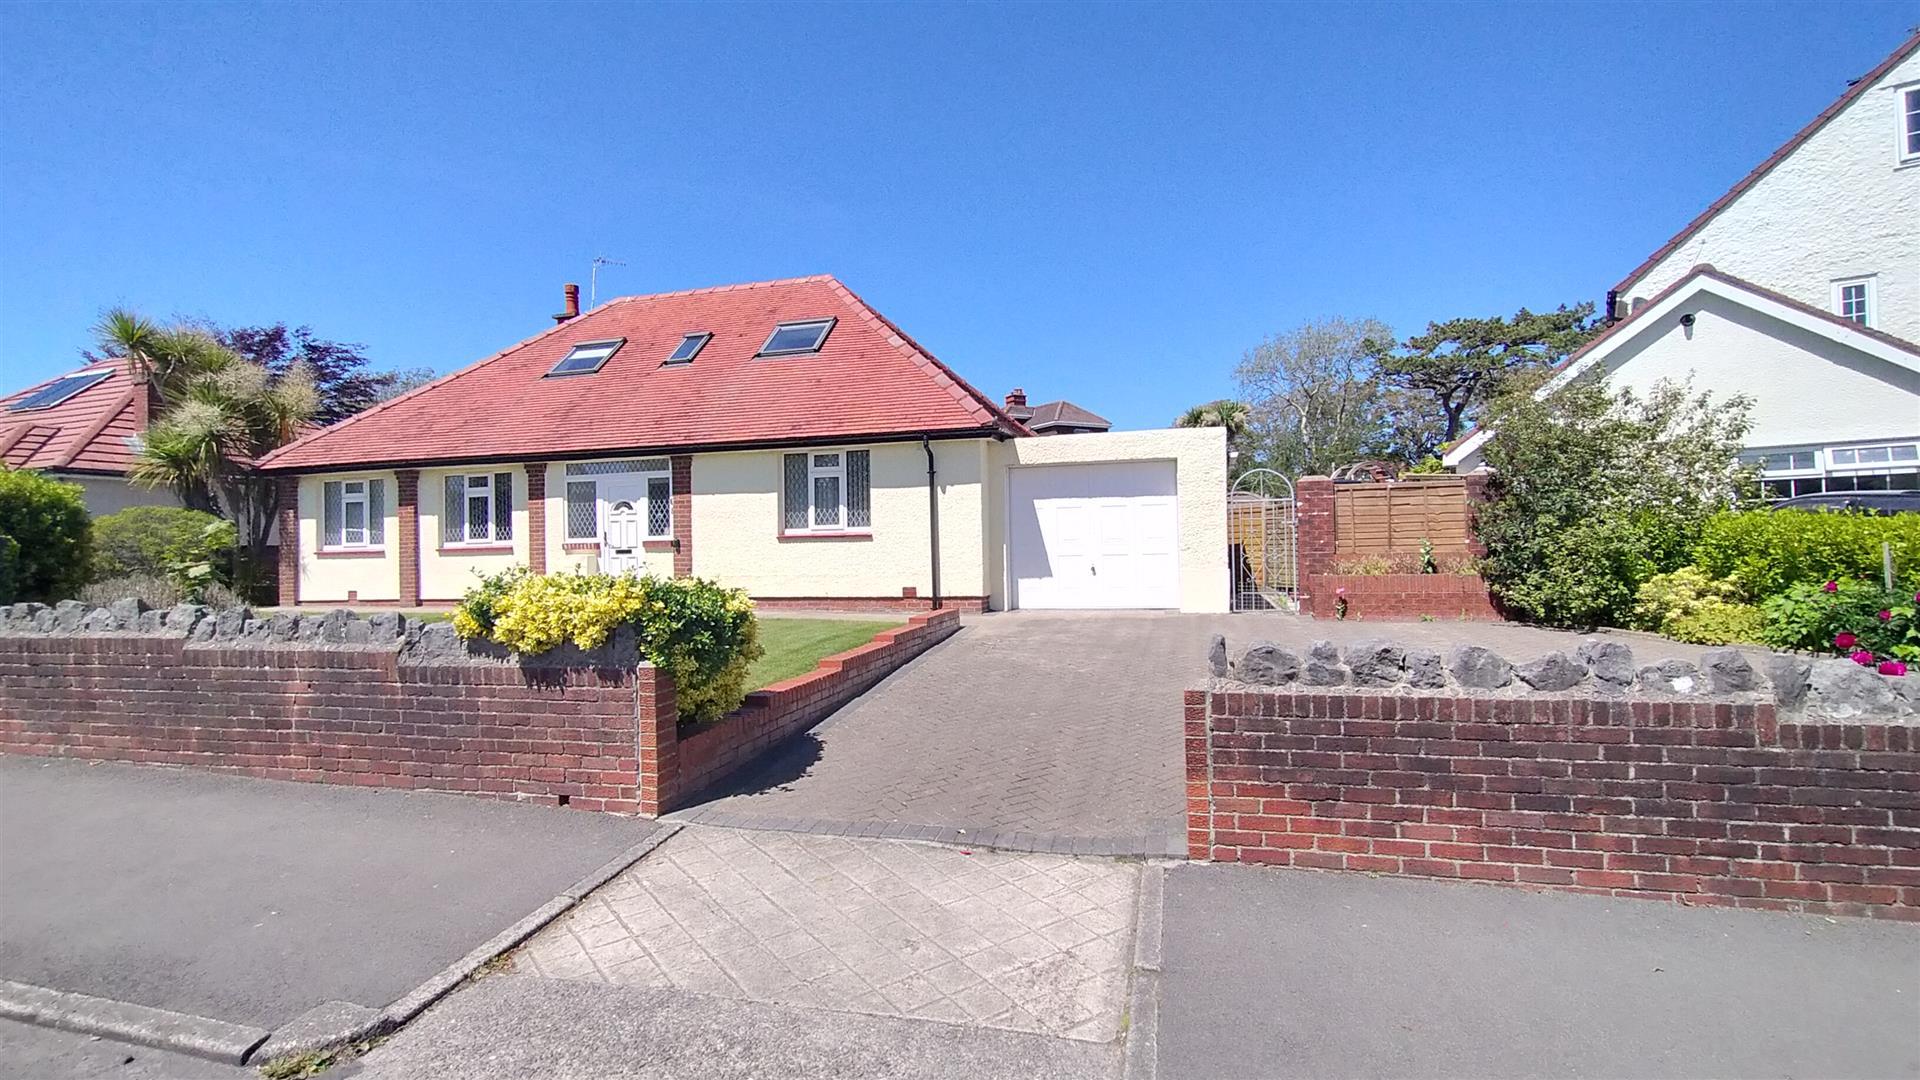 Murton Lane, Newton, Swansea, SA3 4TR